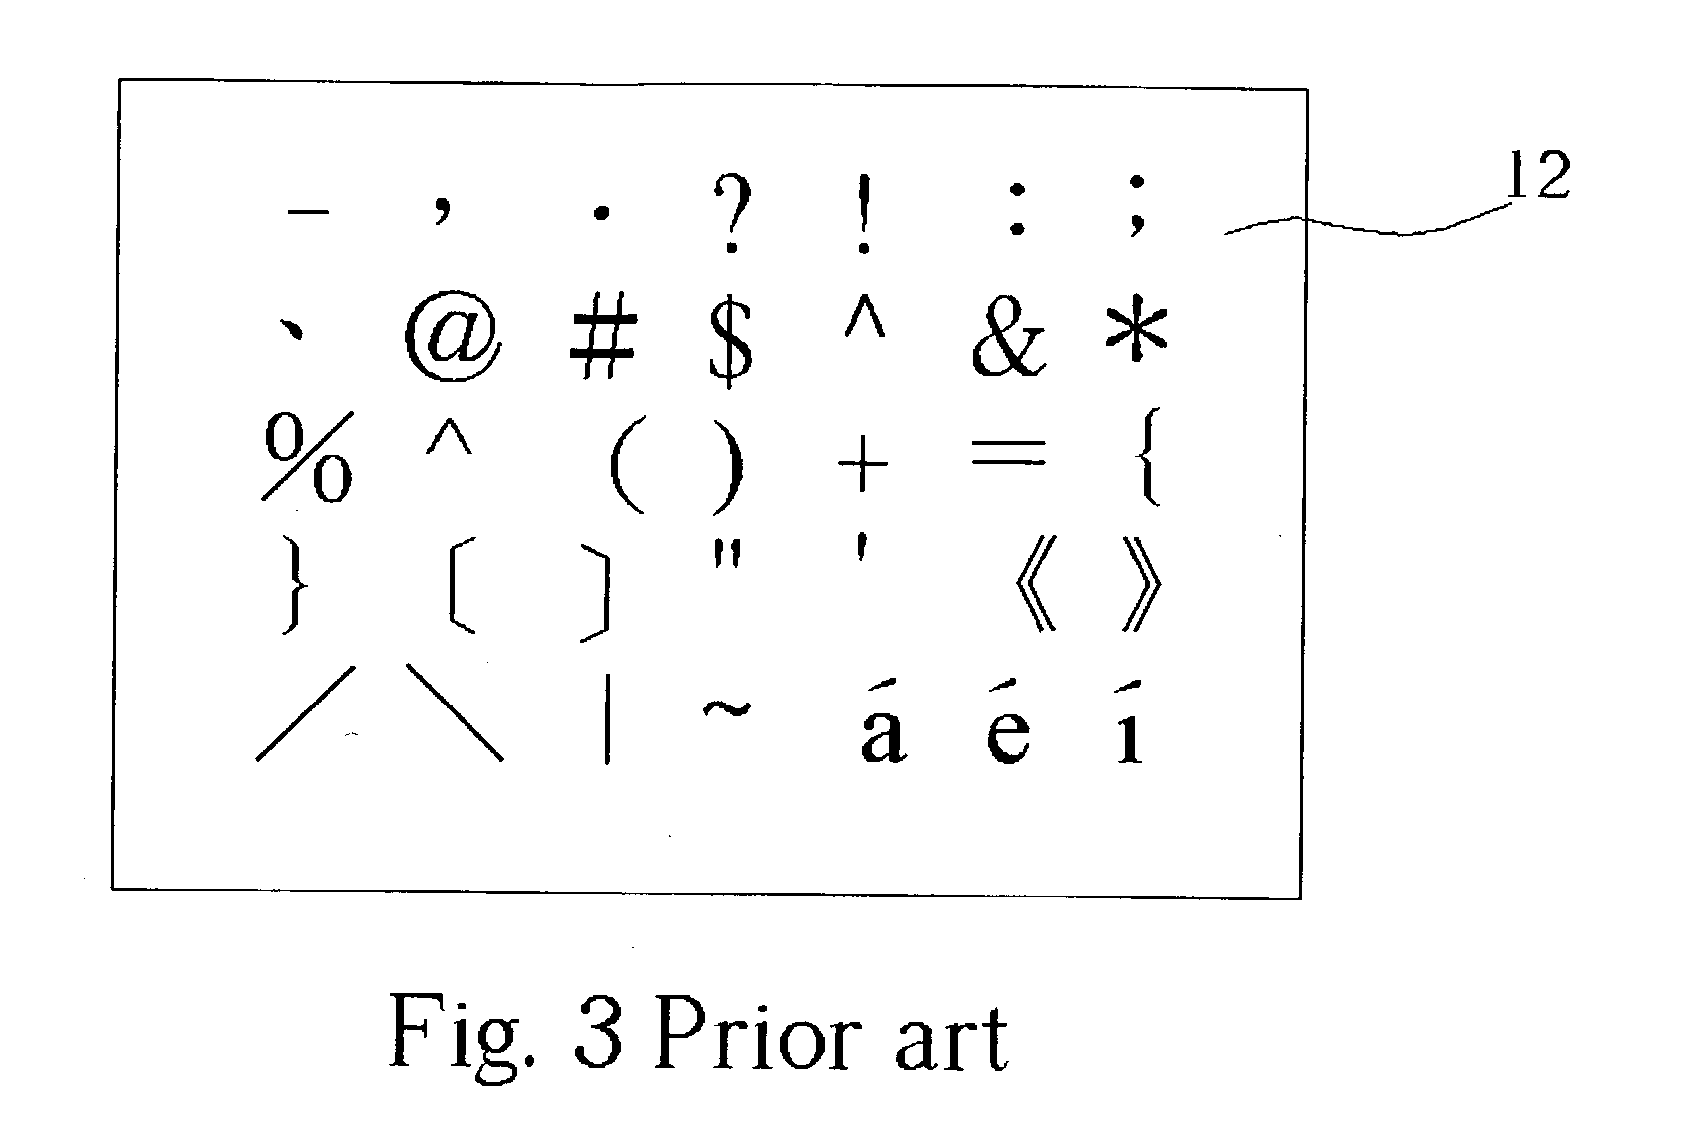 11 Font Used On Us Symbols Images